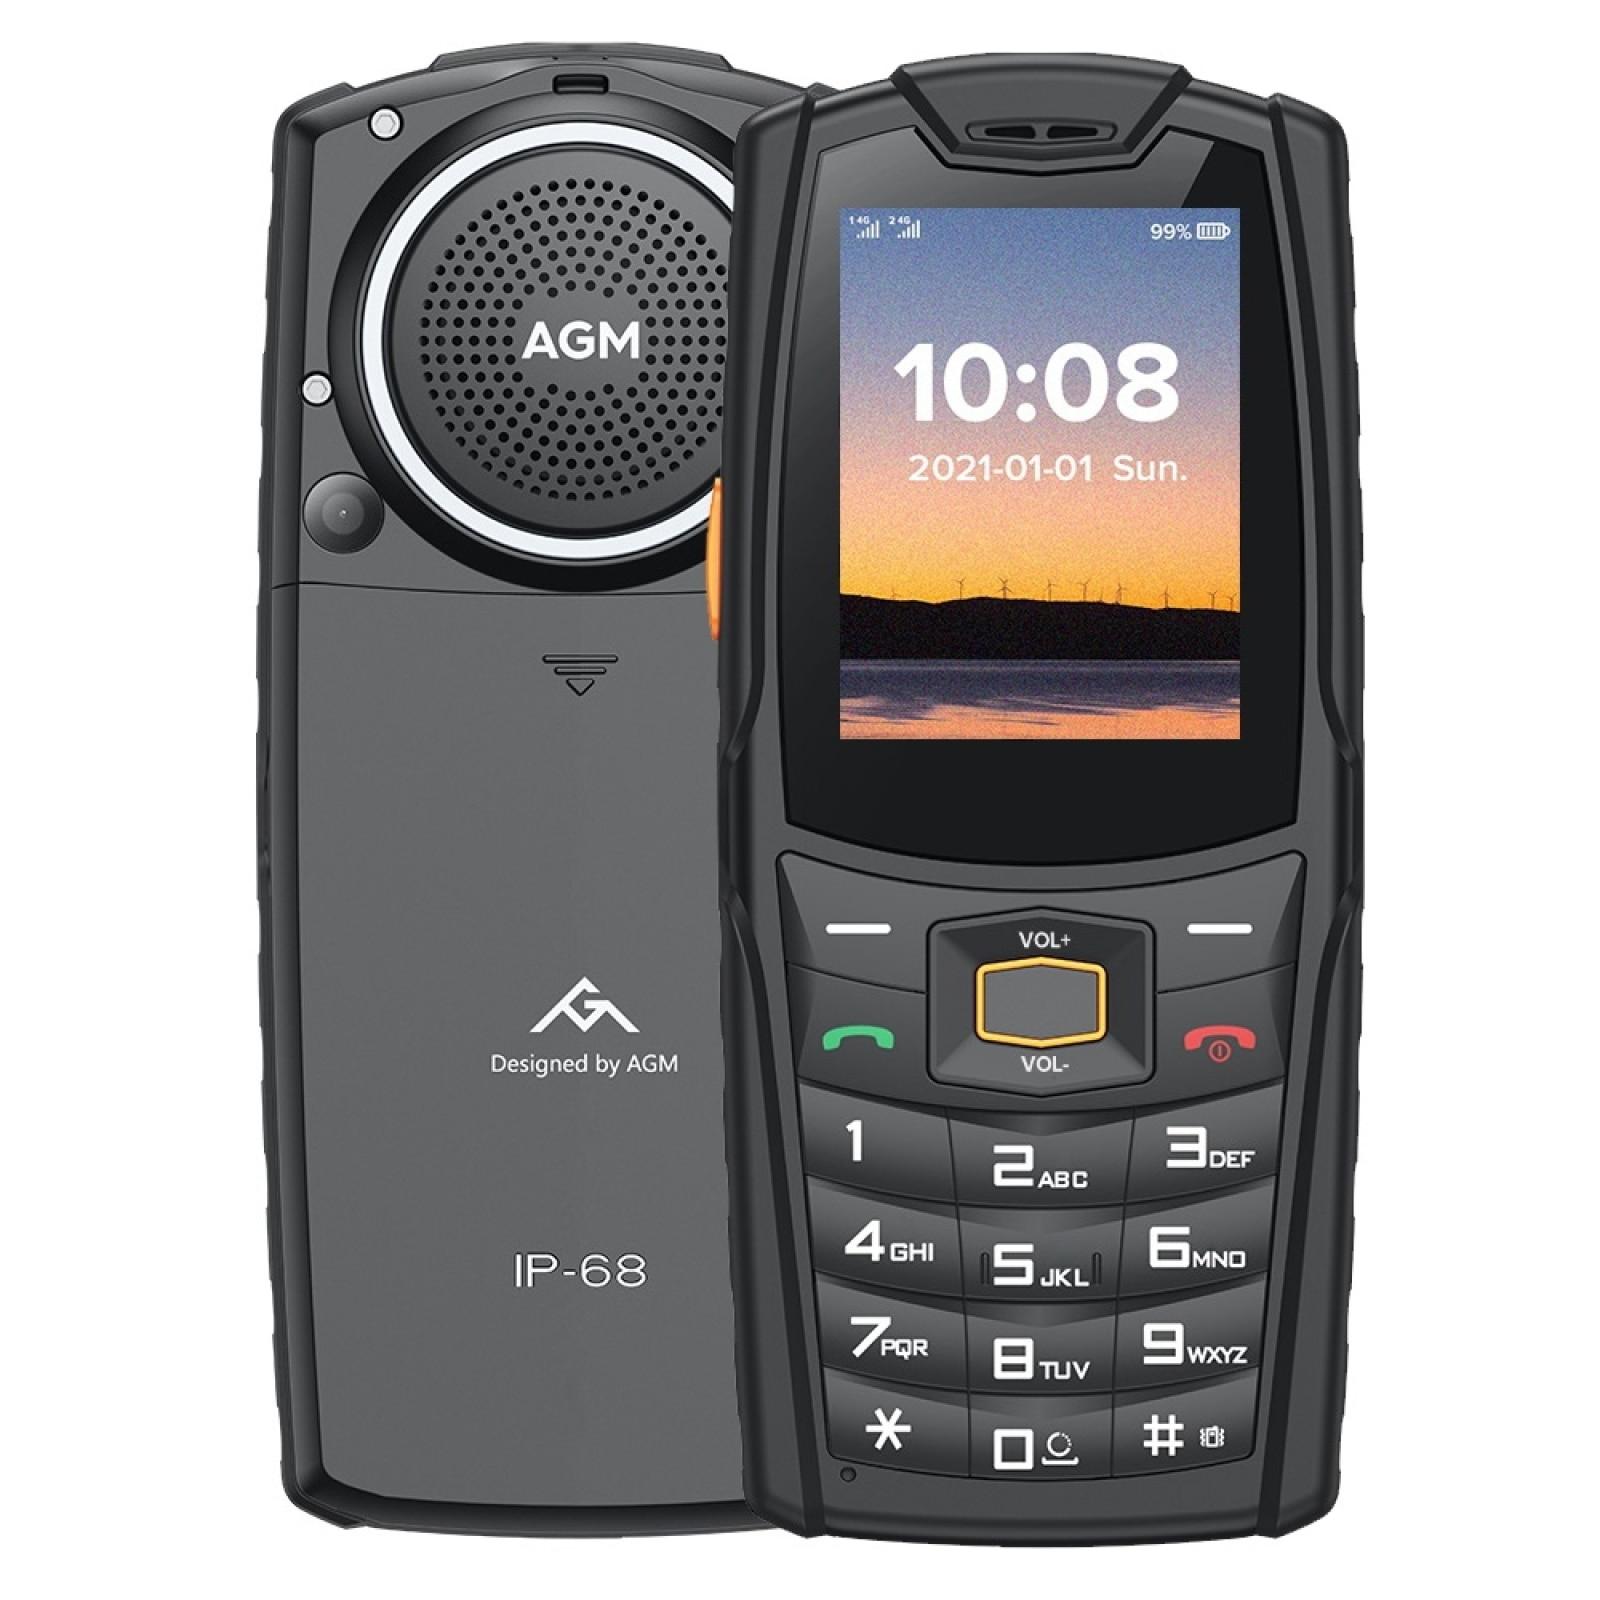 AGM M6 GSM Phone 2.4 Inch 4G Mobile IP68 Push-Button Cellphones Keypad Phone Speaker 2500mAh Rugged